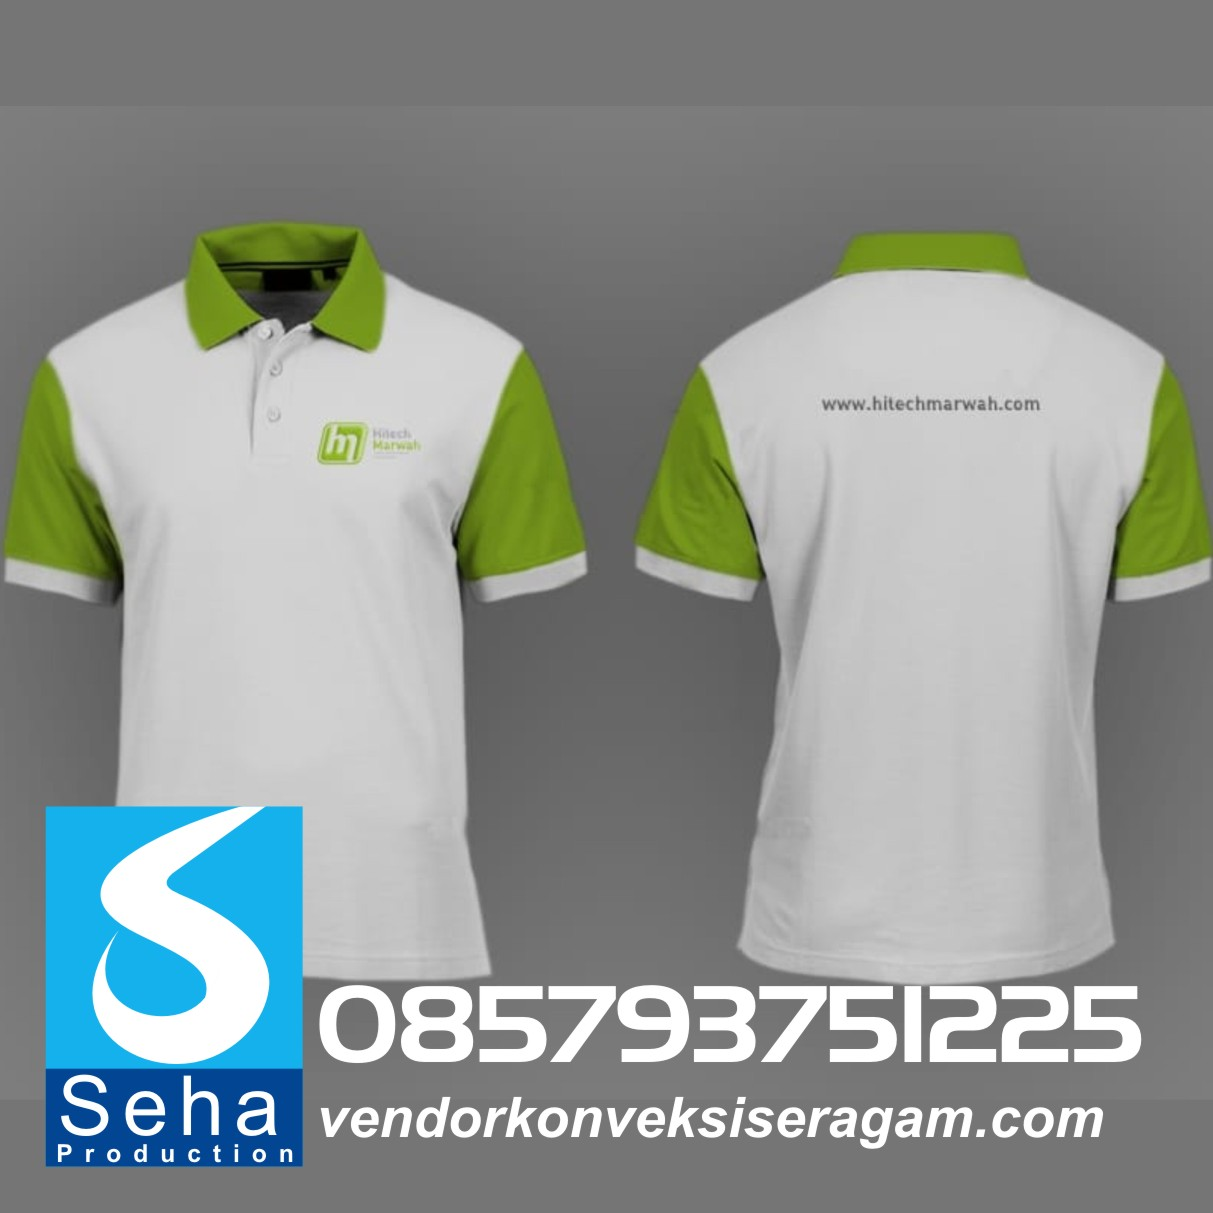 pesan kaos seragam 08579371225